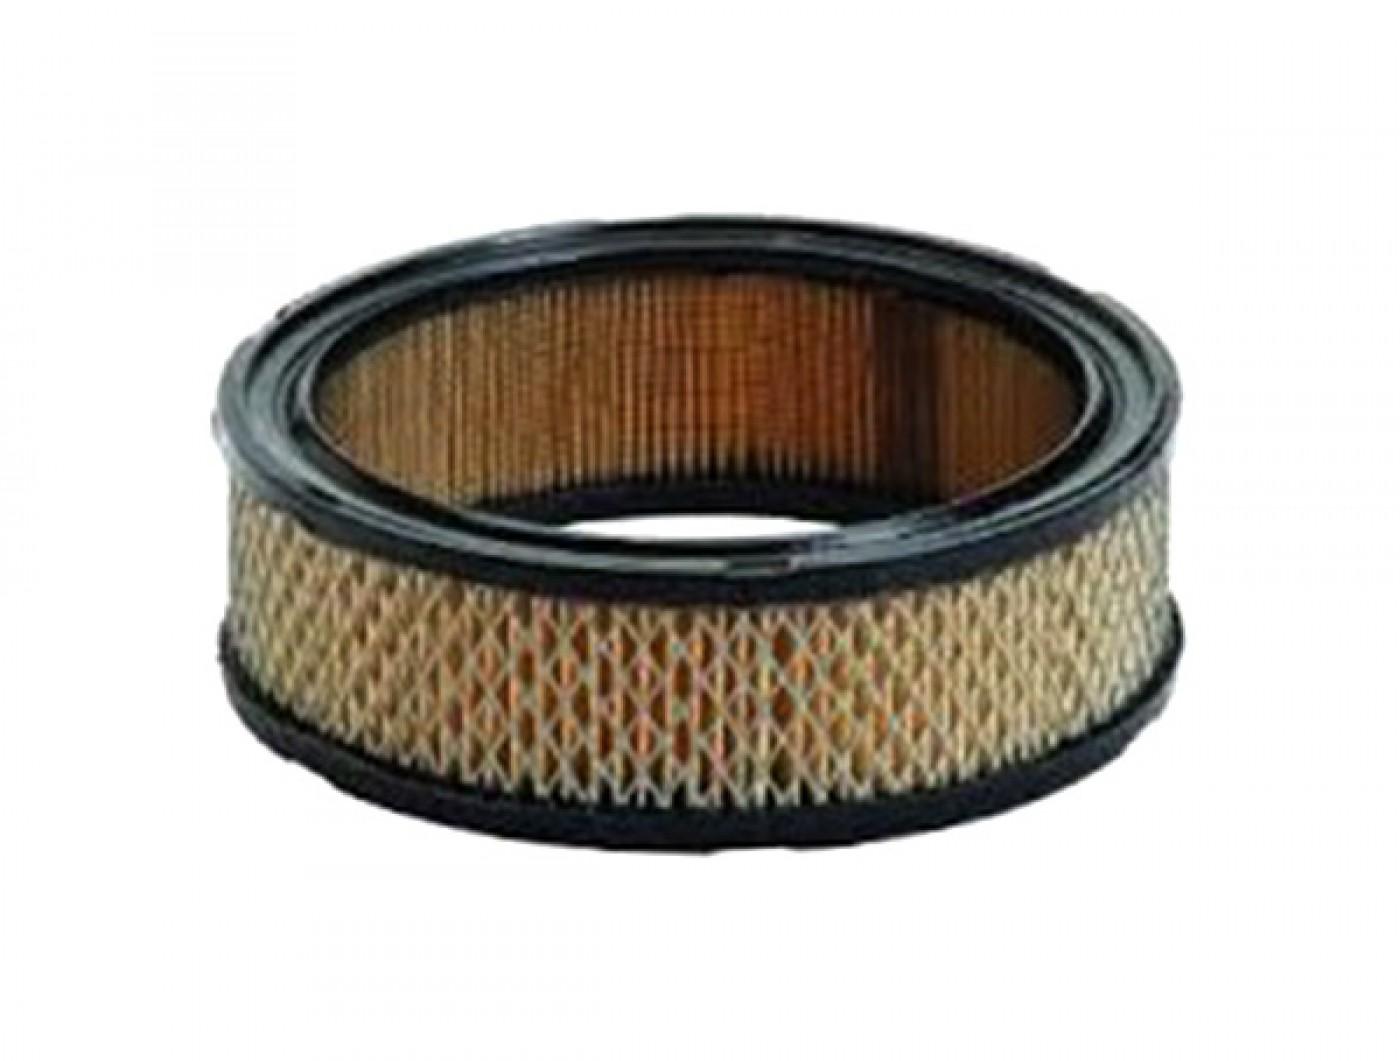 Vzduchový filter Briggs & Stratton VANGUARD 2 Válce